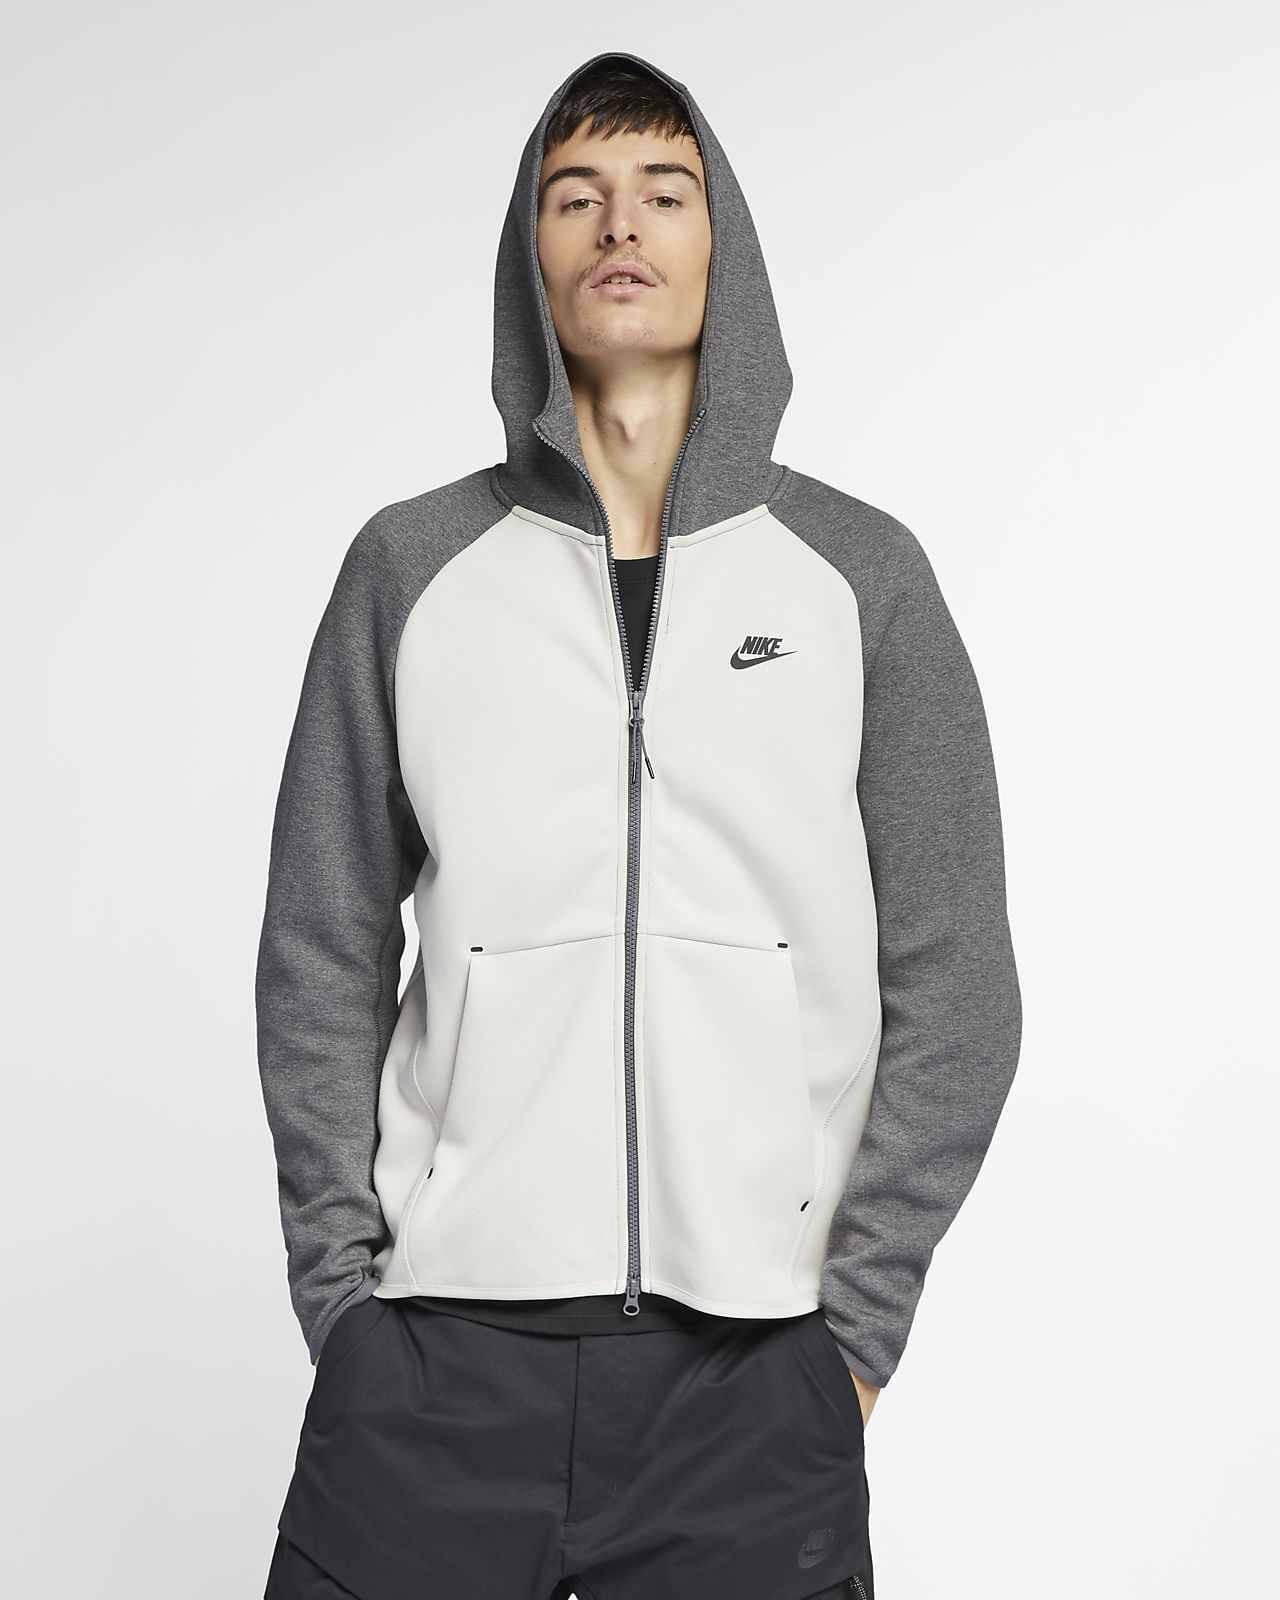 f18fb15c3509 Ανδρική μπλούζα με κουκούλα και φερμουάρ Nike Sportswear Tech Fleece ...